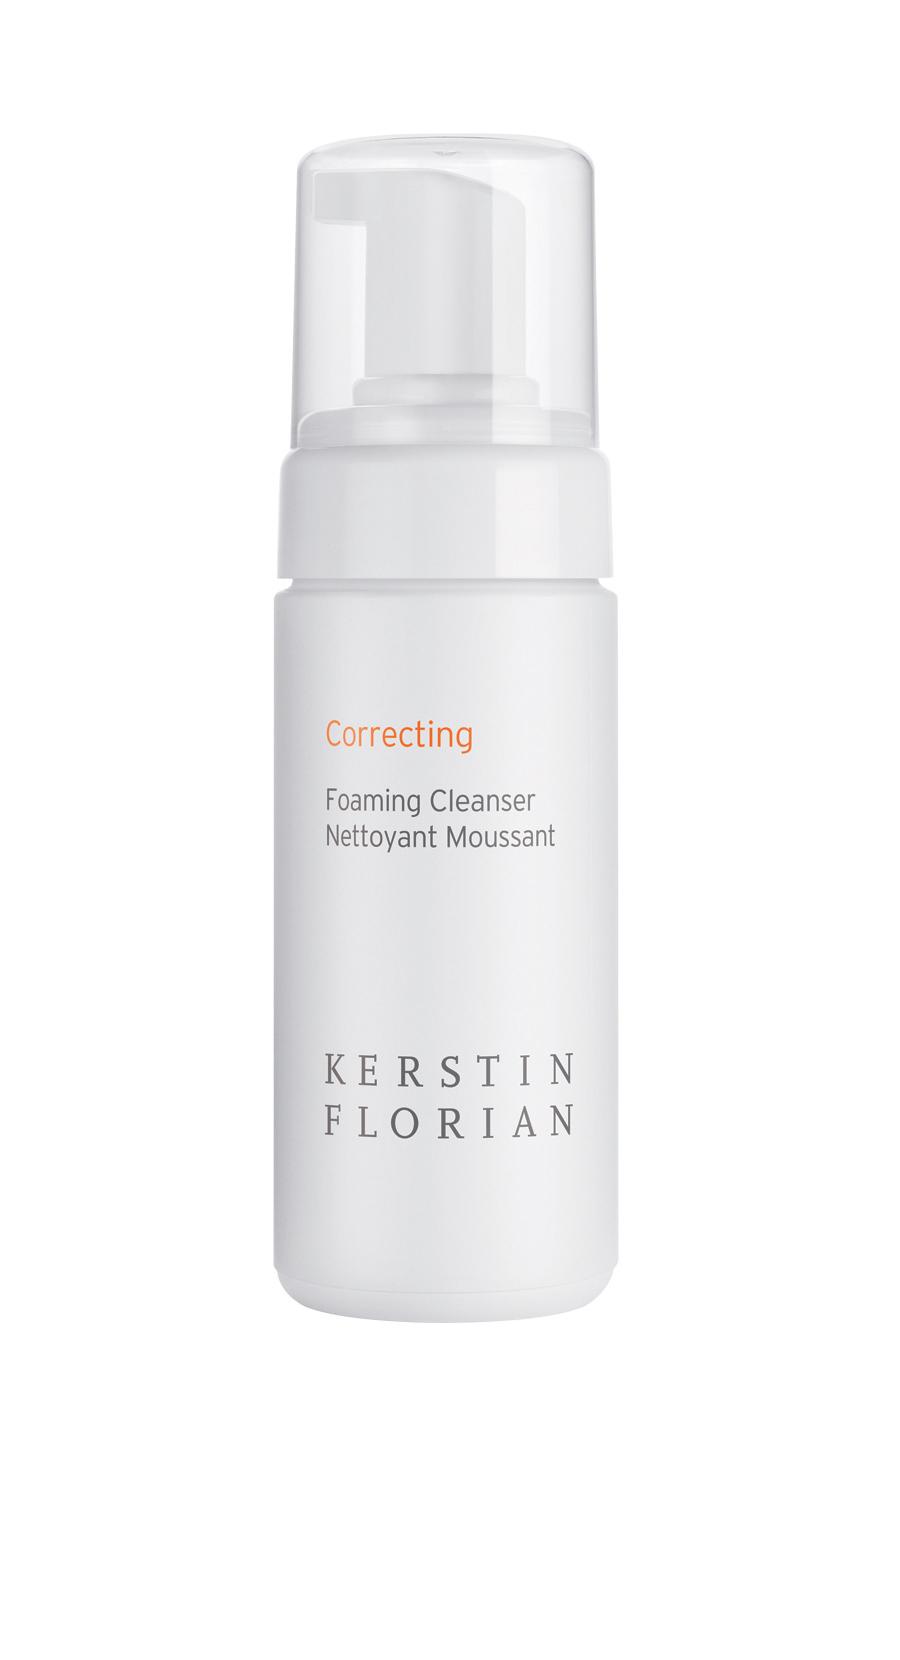 Очищающая пенка/ Corr. Foaming Cleanser (100 мл.)